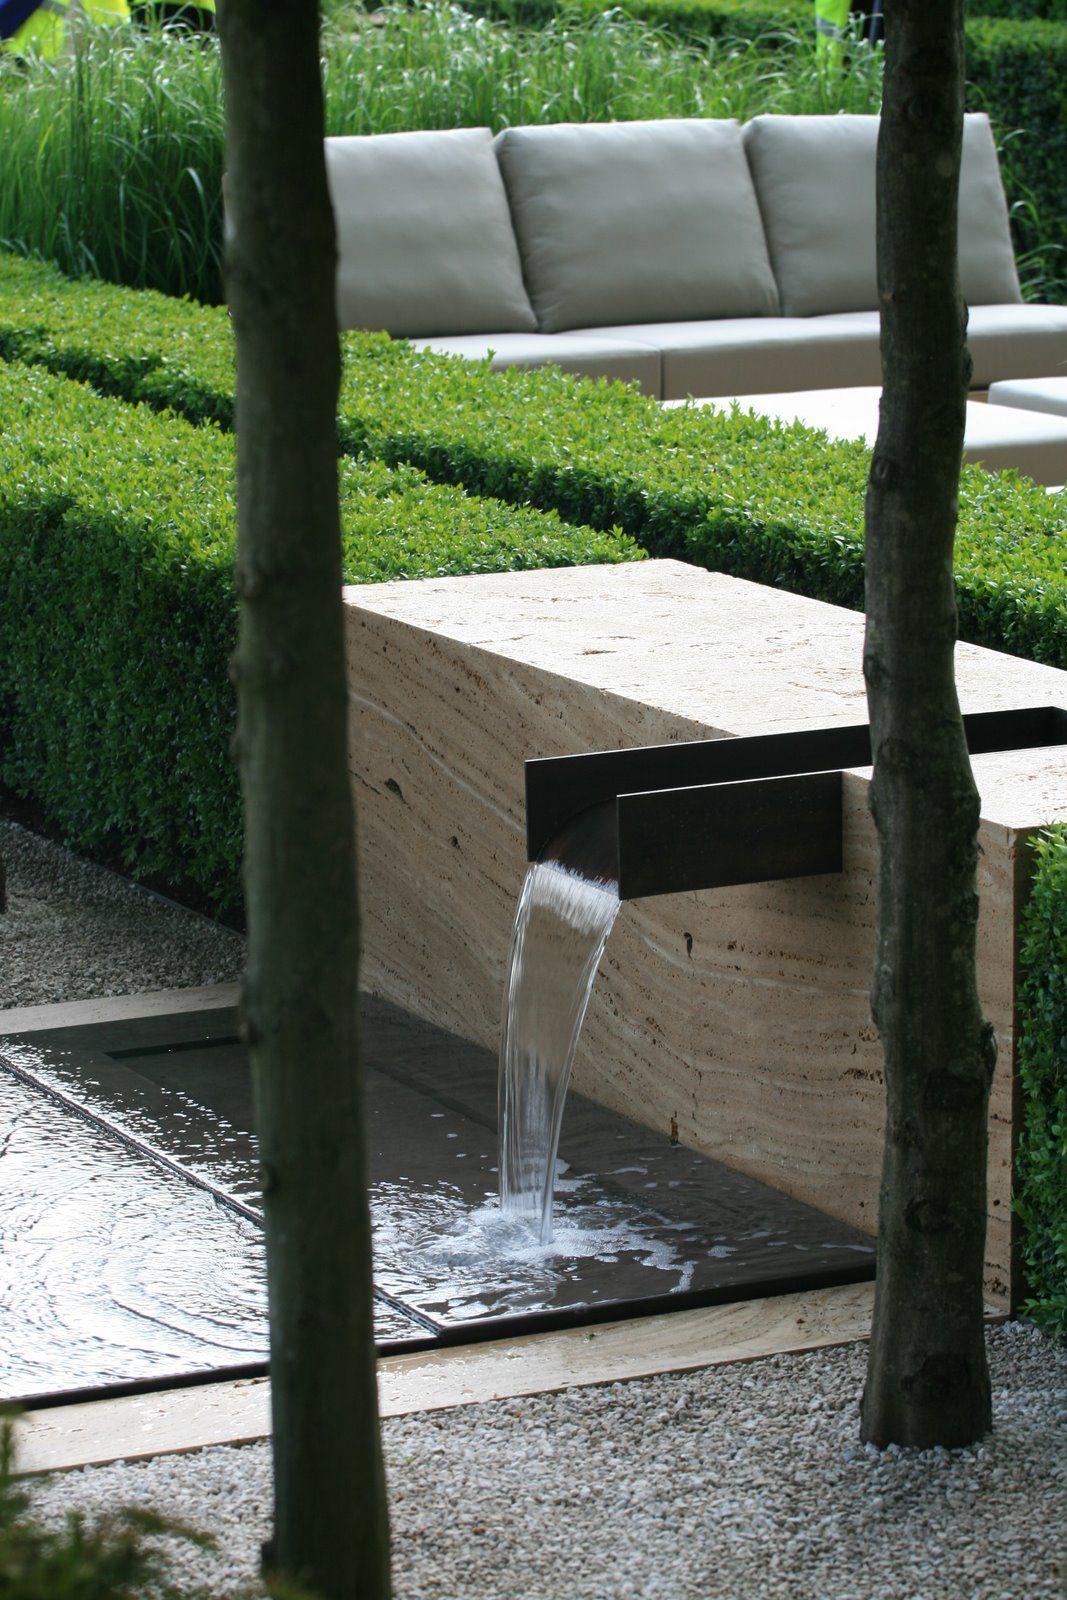 Décoration De Jardin Moderne Avec Bassin Aquatique | Deco ... serapportantà Bassin De Jardin Moderne